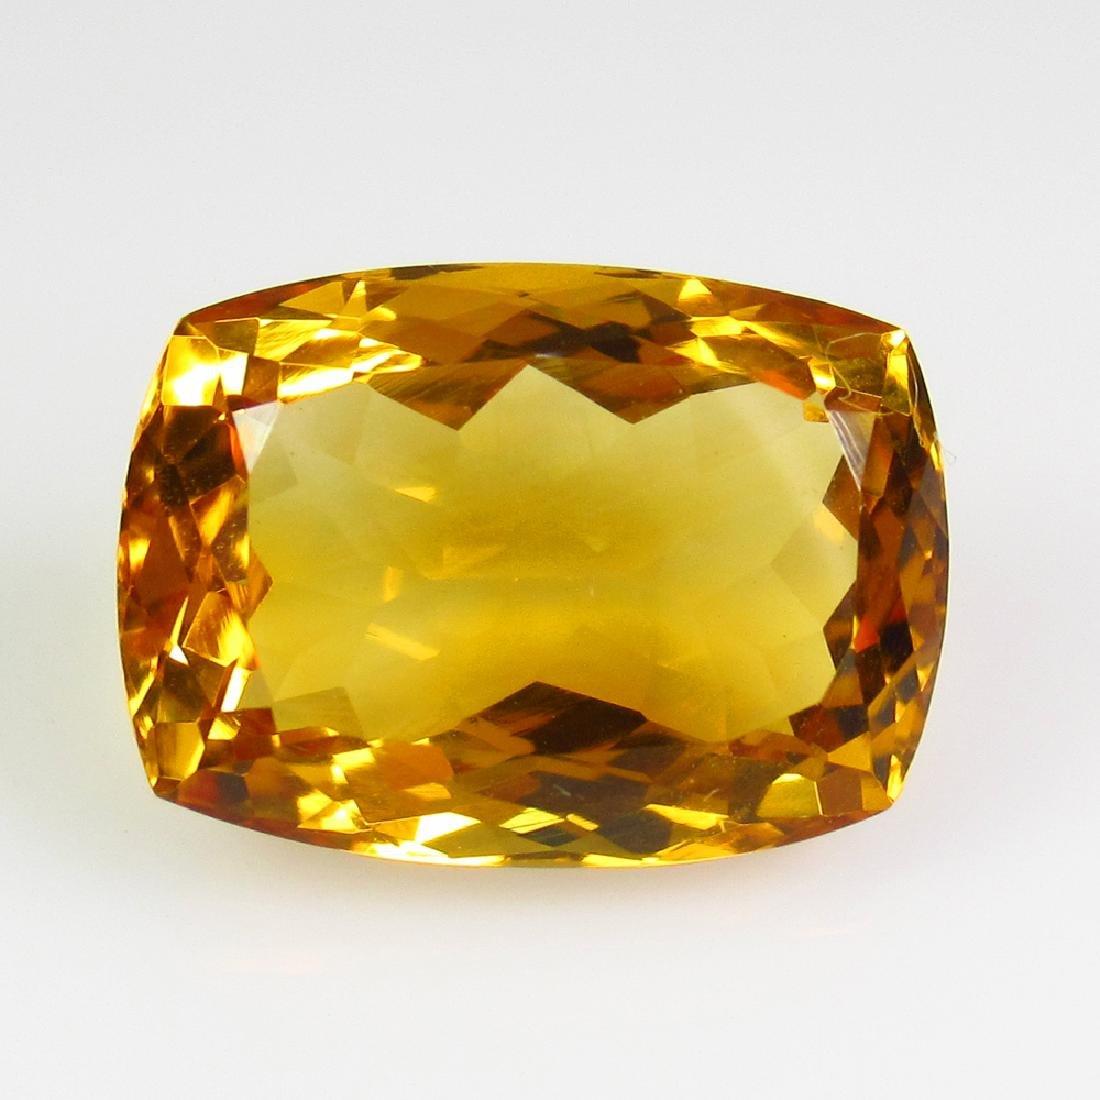 9.09 Ct Genuine Madeira Brandy Yellow Citrine Oval